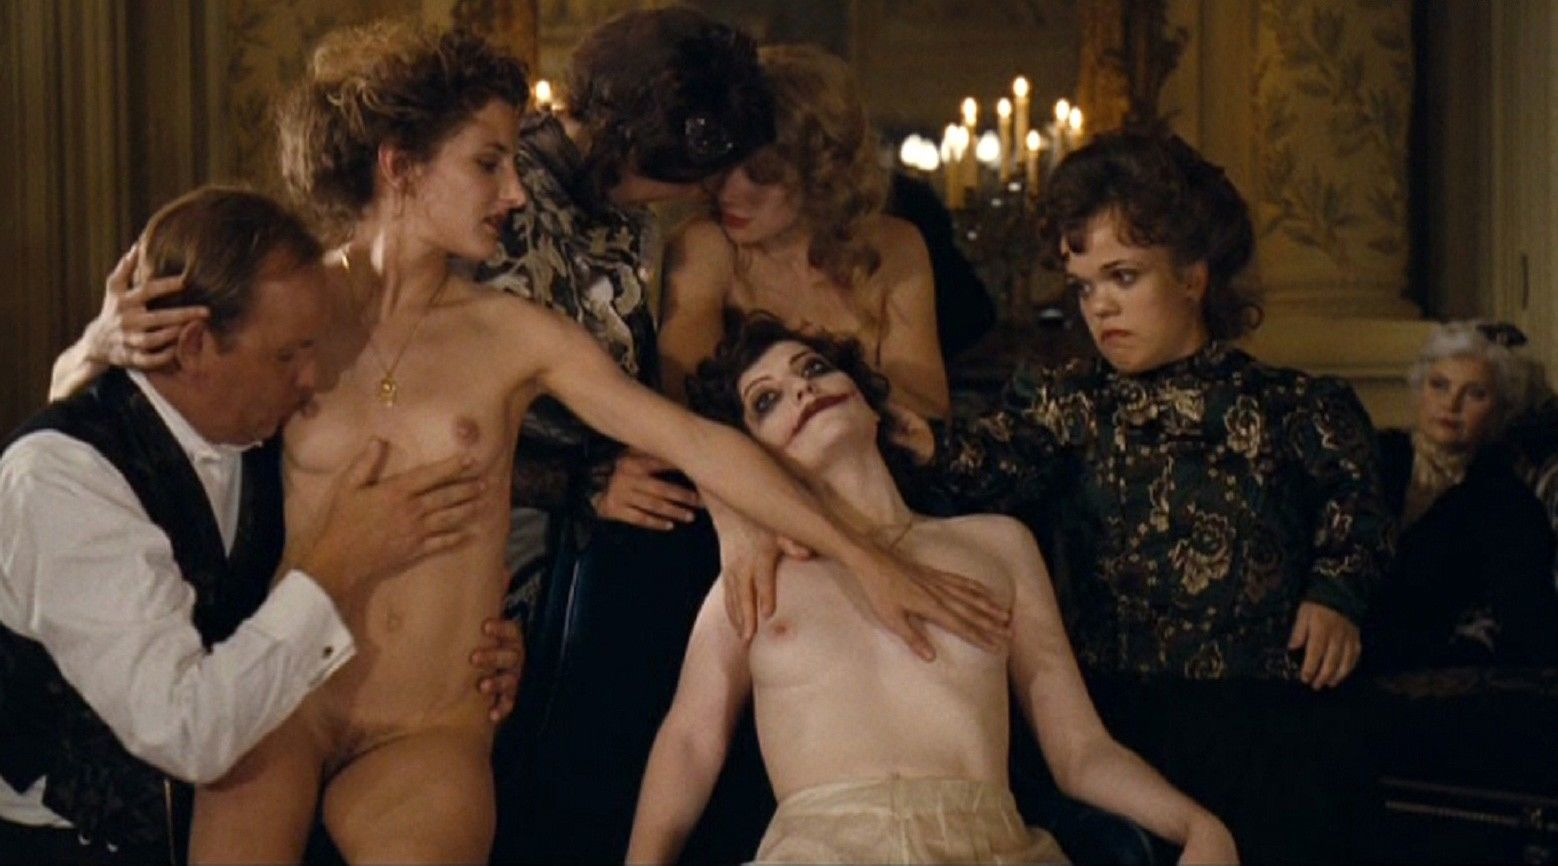 Hafsia herzi nude pics pics, sex tape ancensored